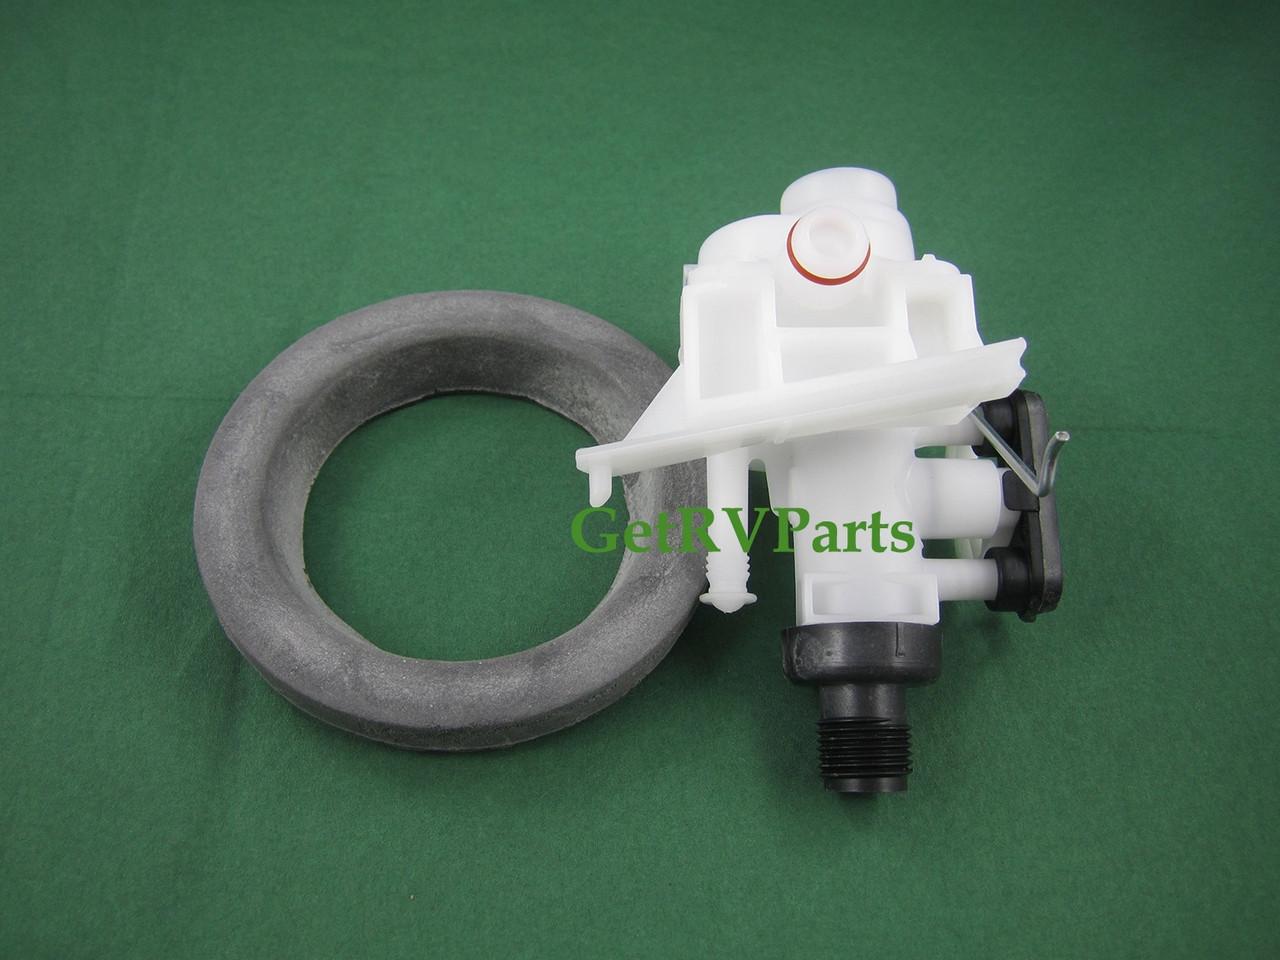 Thetford Toilet Parts : Genuine thetford rv toilet water valve fits aqua magic iv